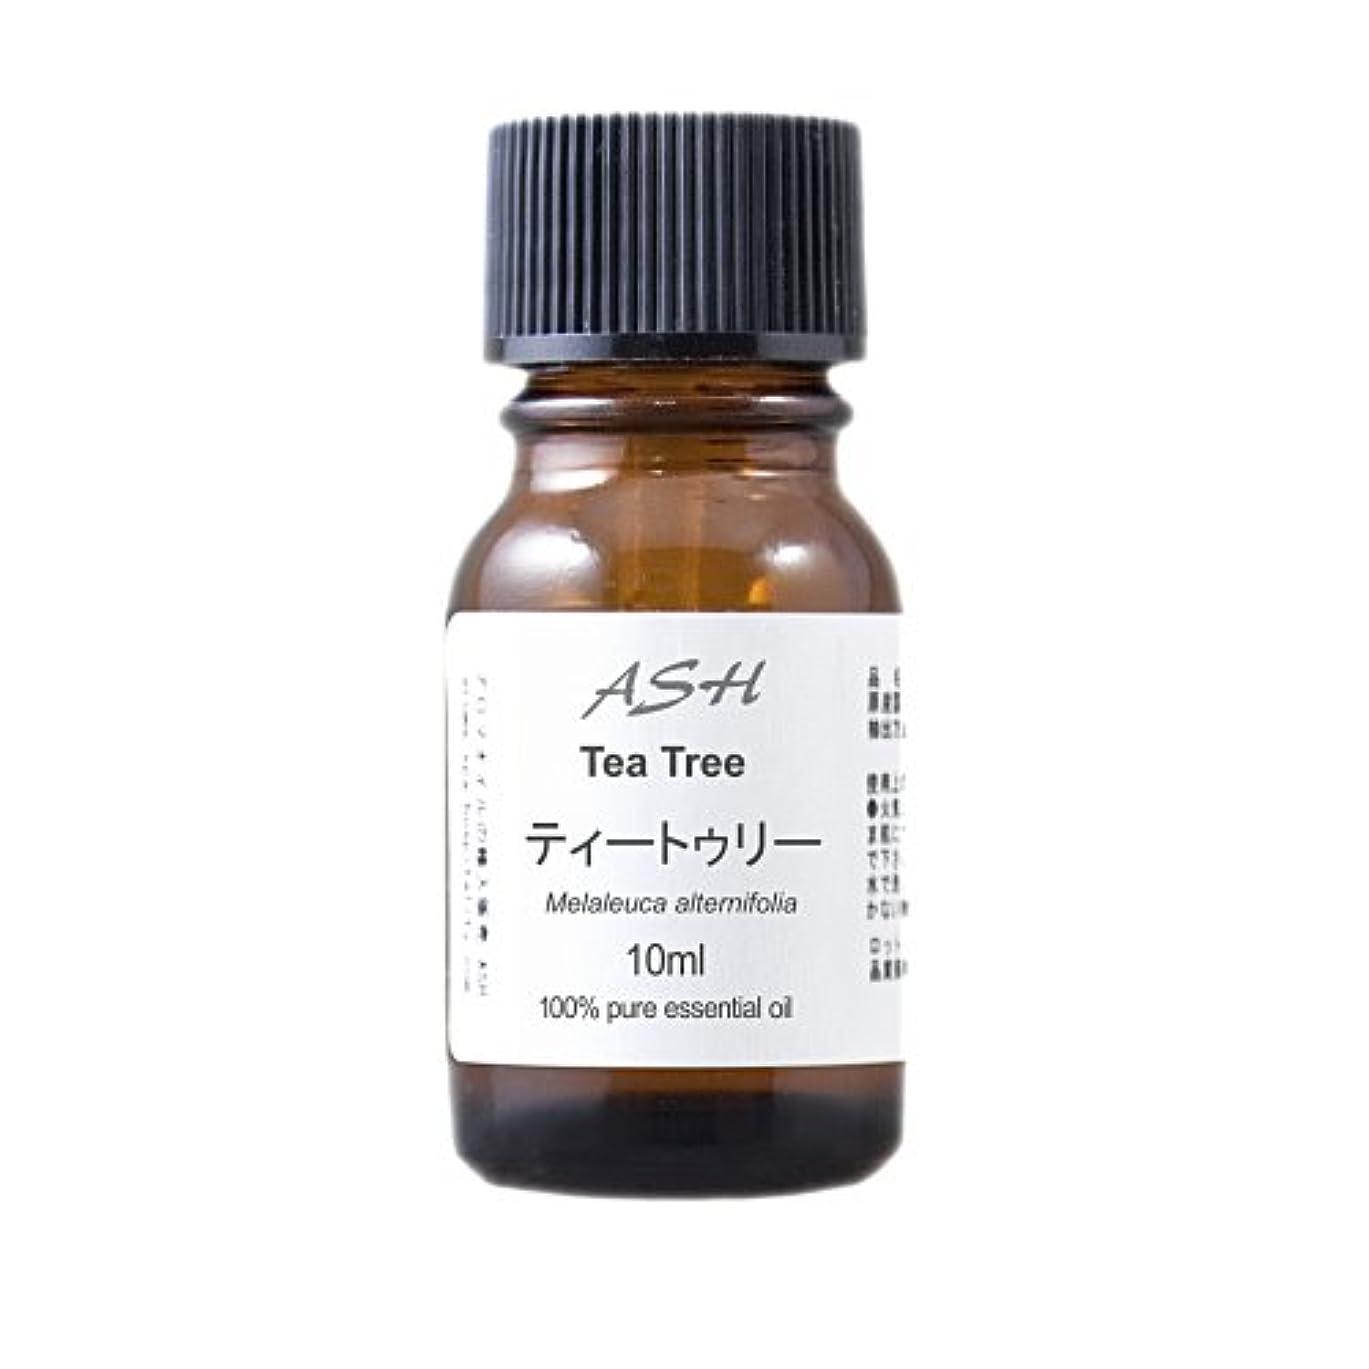 ASH ティートゥリー (ティーツリー) エッセンシャルオイル 10ml AEAJ表示基準適合認定精油